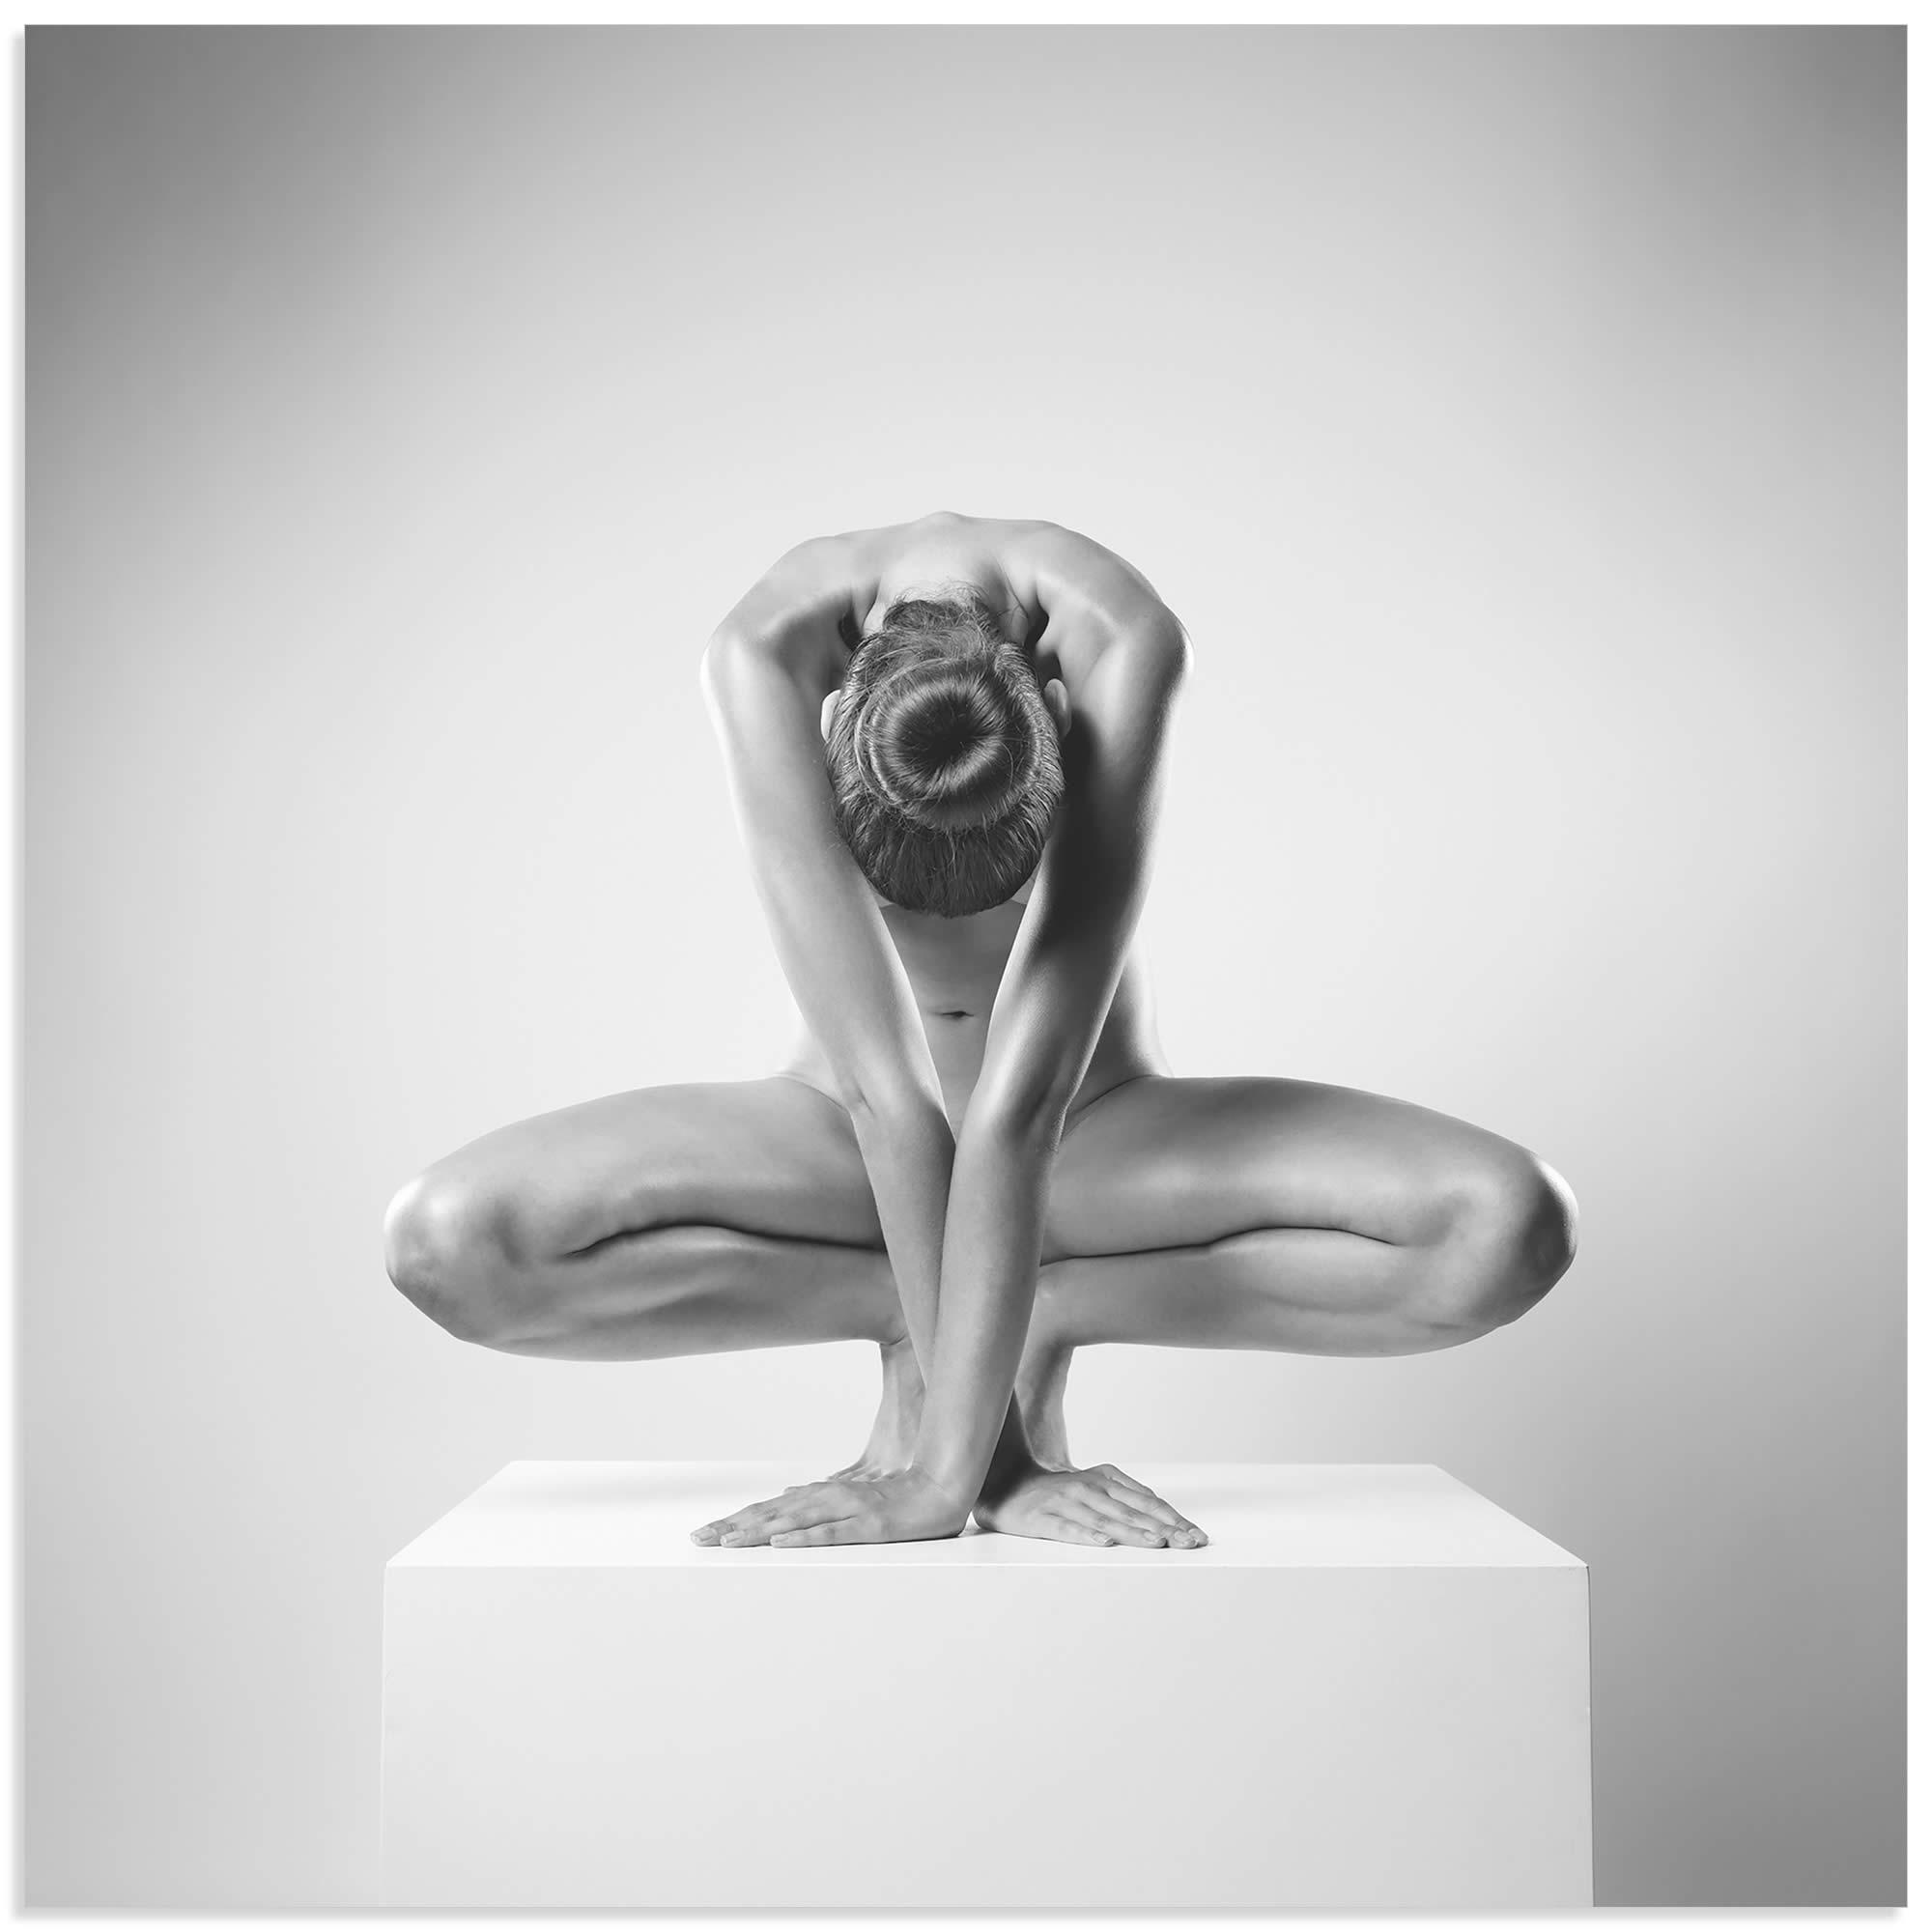 Cross by Arkadiusz Branicki - Human Form Photography on Metal or Acrylic